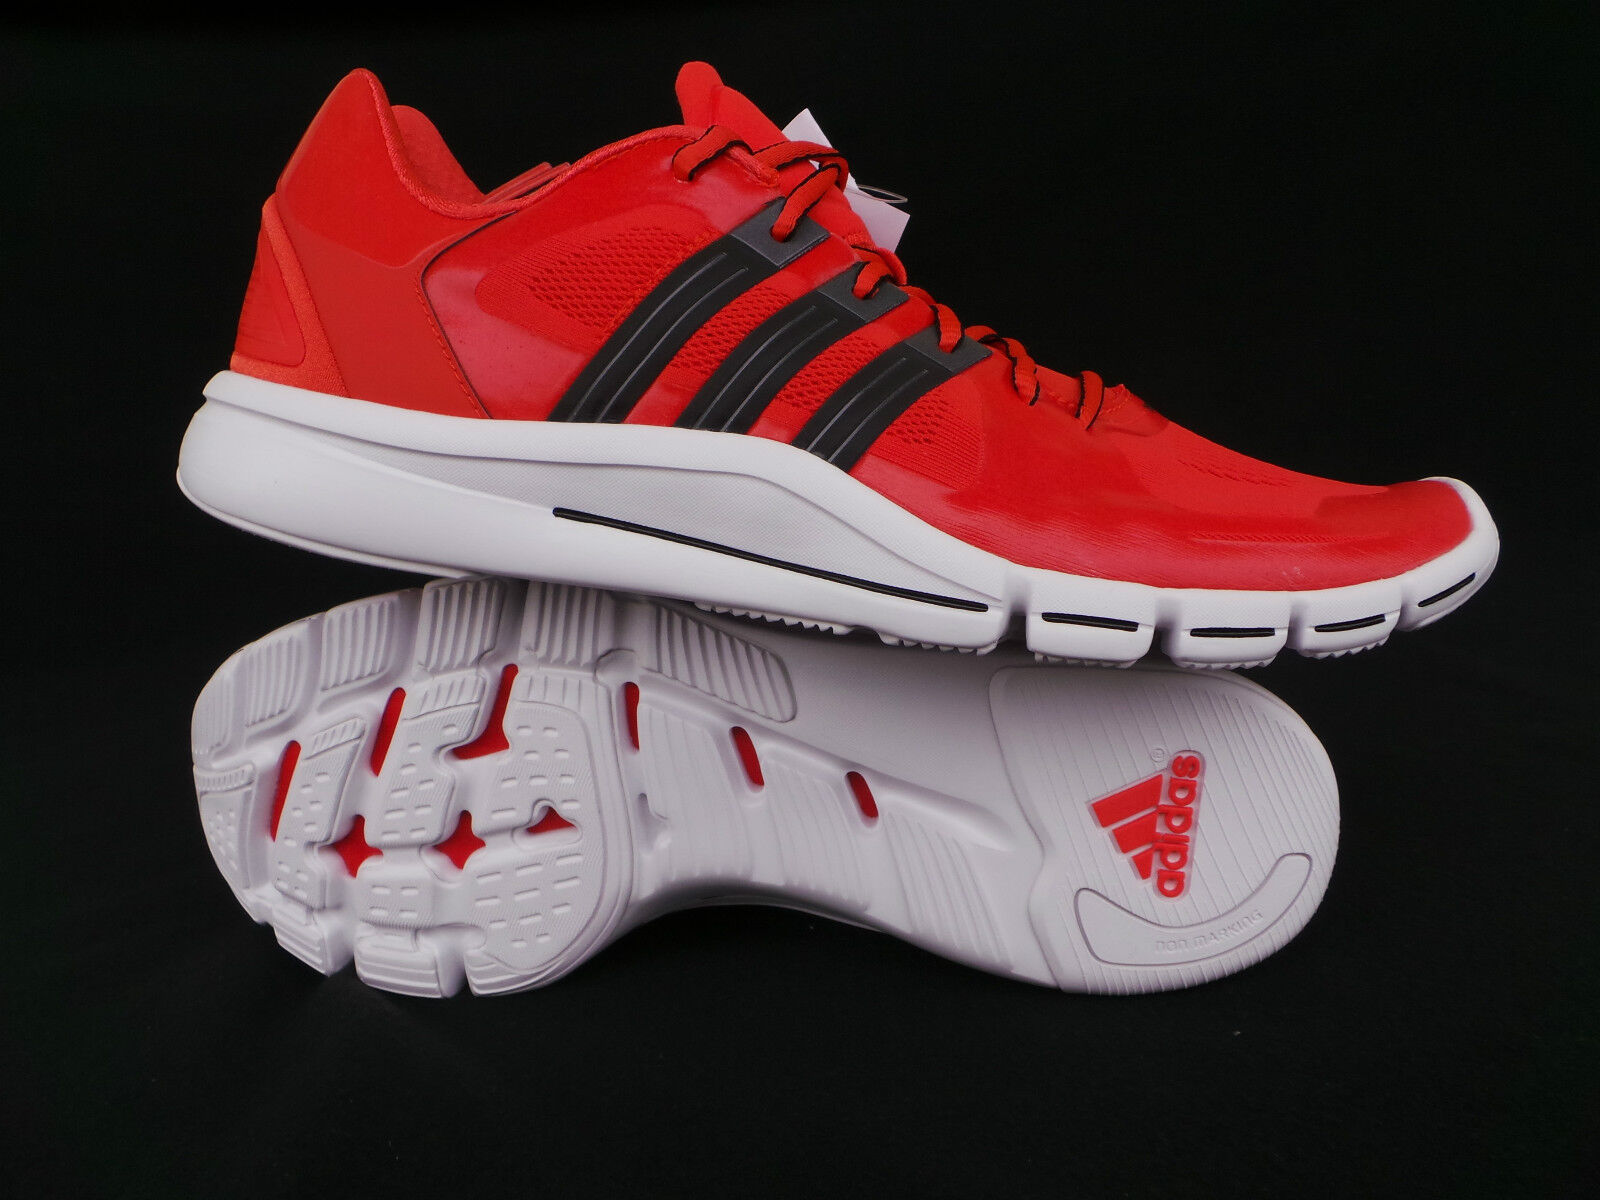 Adidas Adipure Herren Turnschuhe Turn SCHUH JOGGING LAUF Fitness Gr 45 1 3 46 2 3